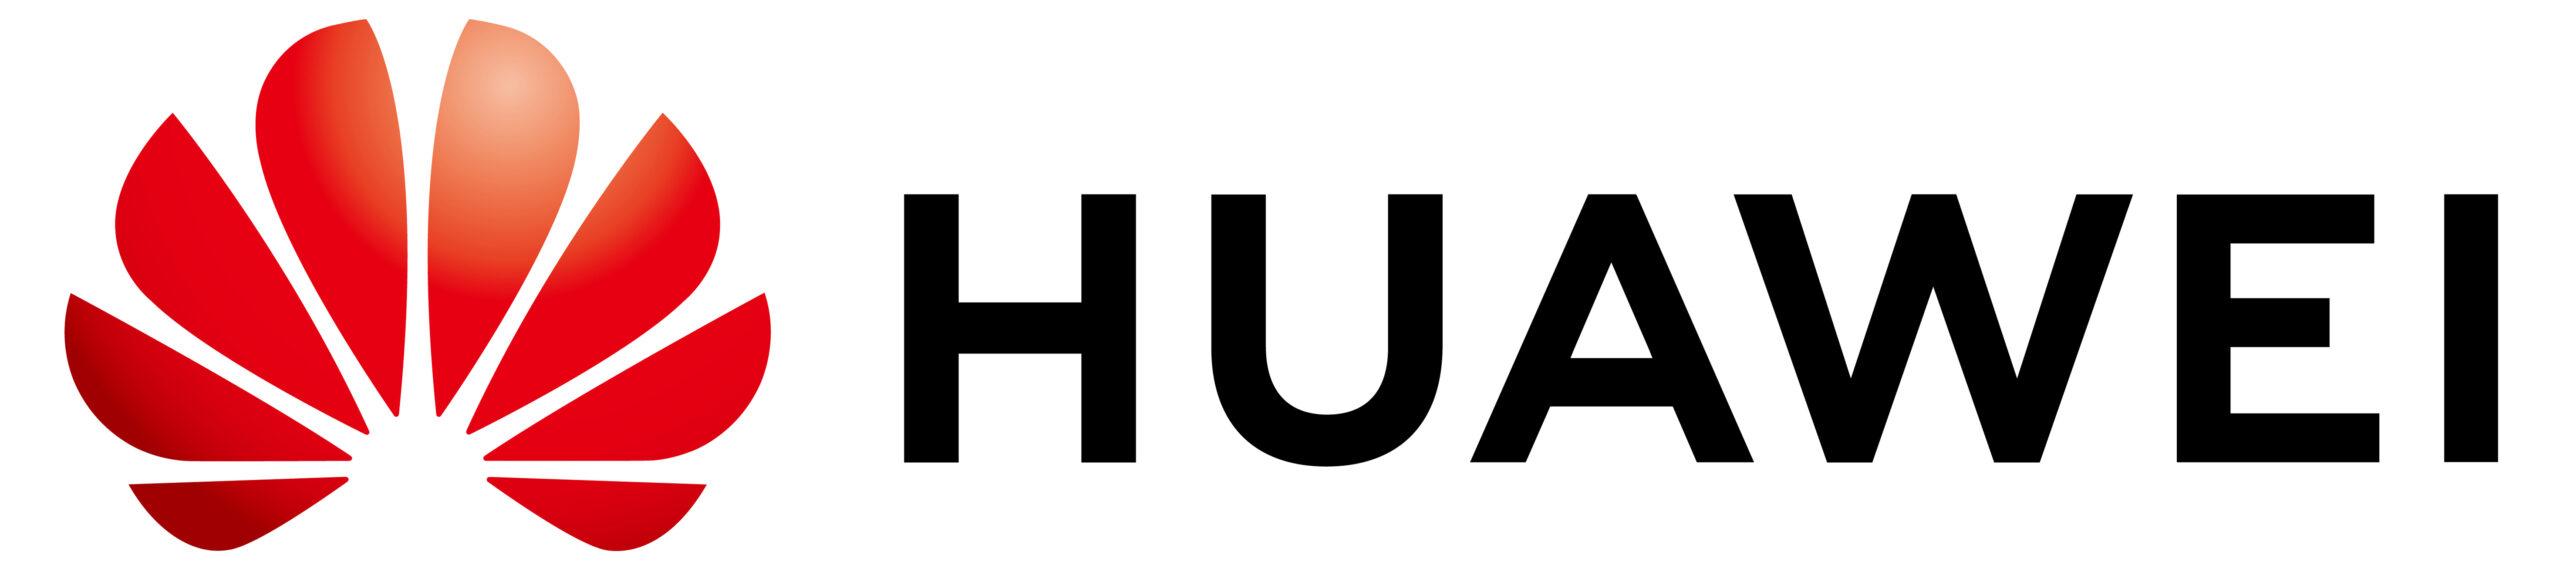 Huawei do Brasil Telecomunicacoes LTDA